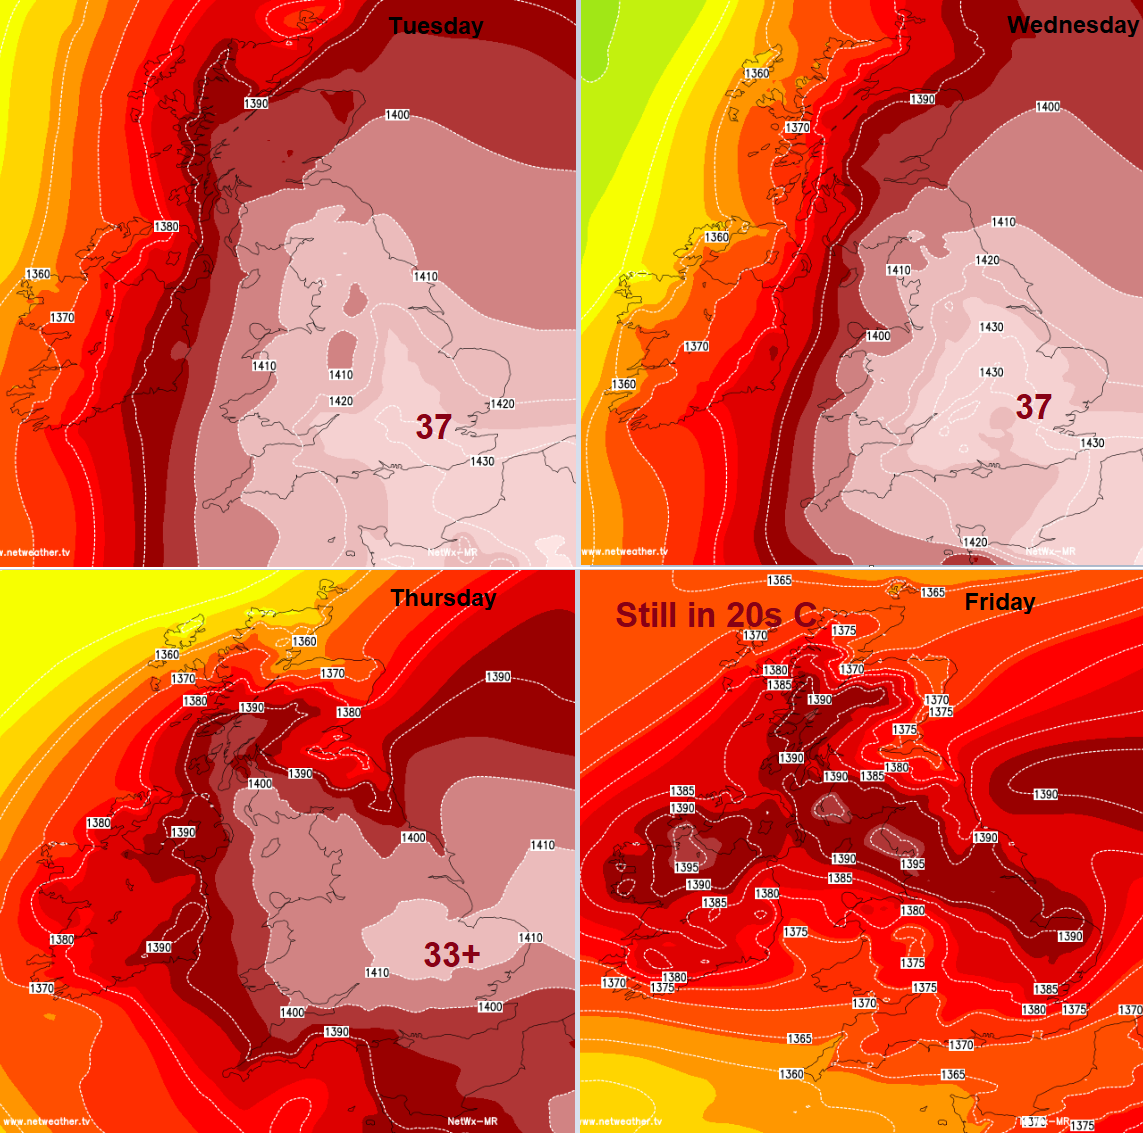 UK temperatures heatwave